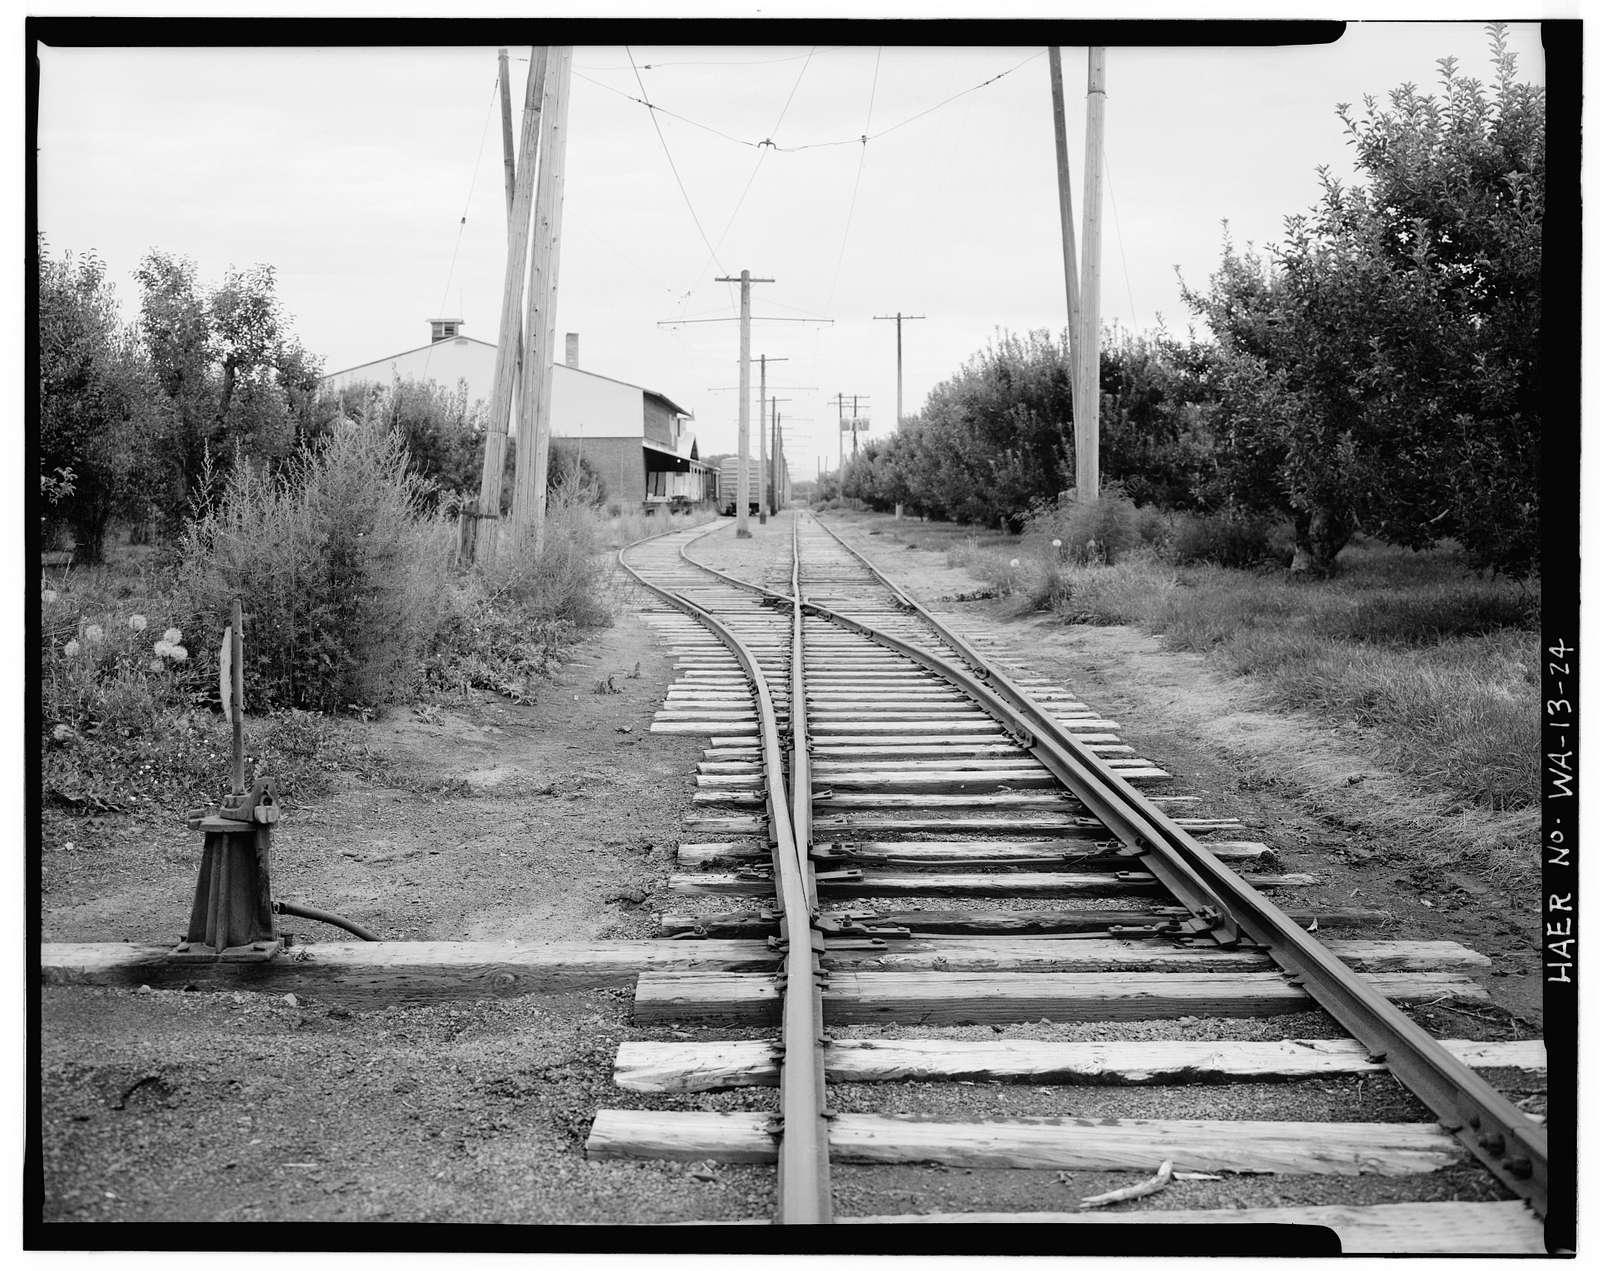 Yakima Valley Transportation Company Interurban Railroad, Connecting towns of Yakima, Selah & Wiley City, Yakima, Yakima County, WA